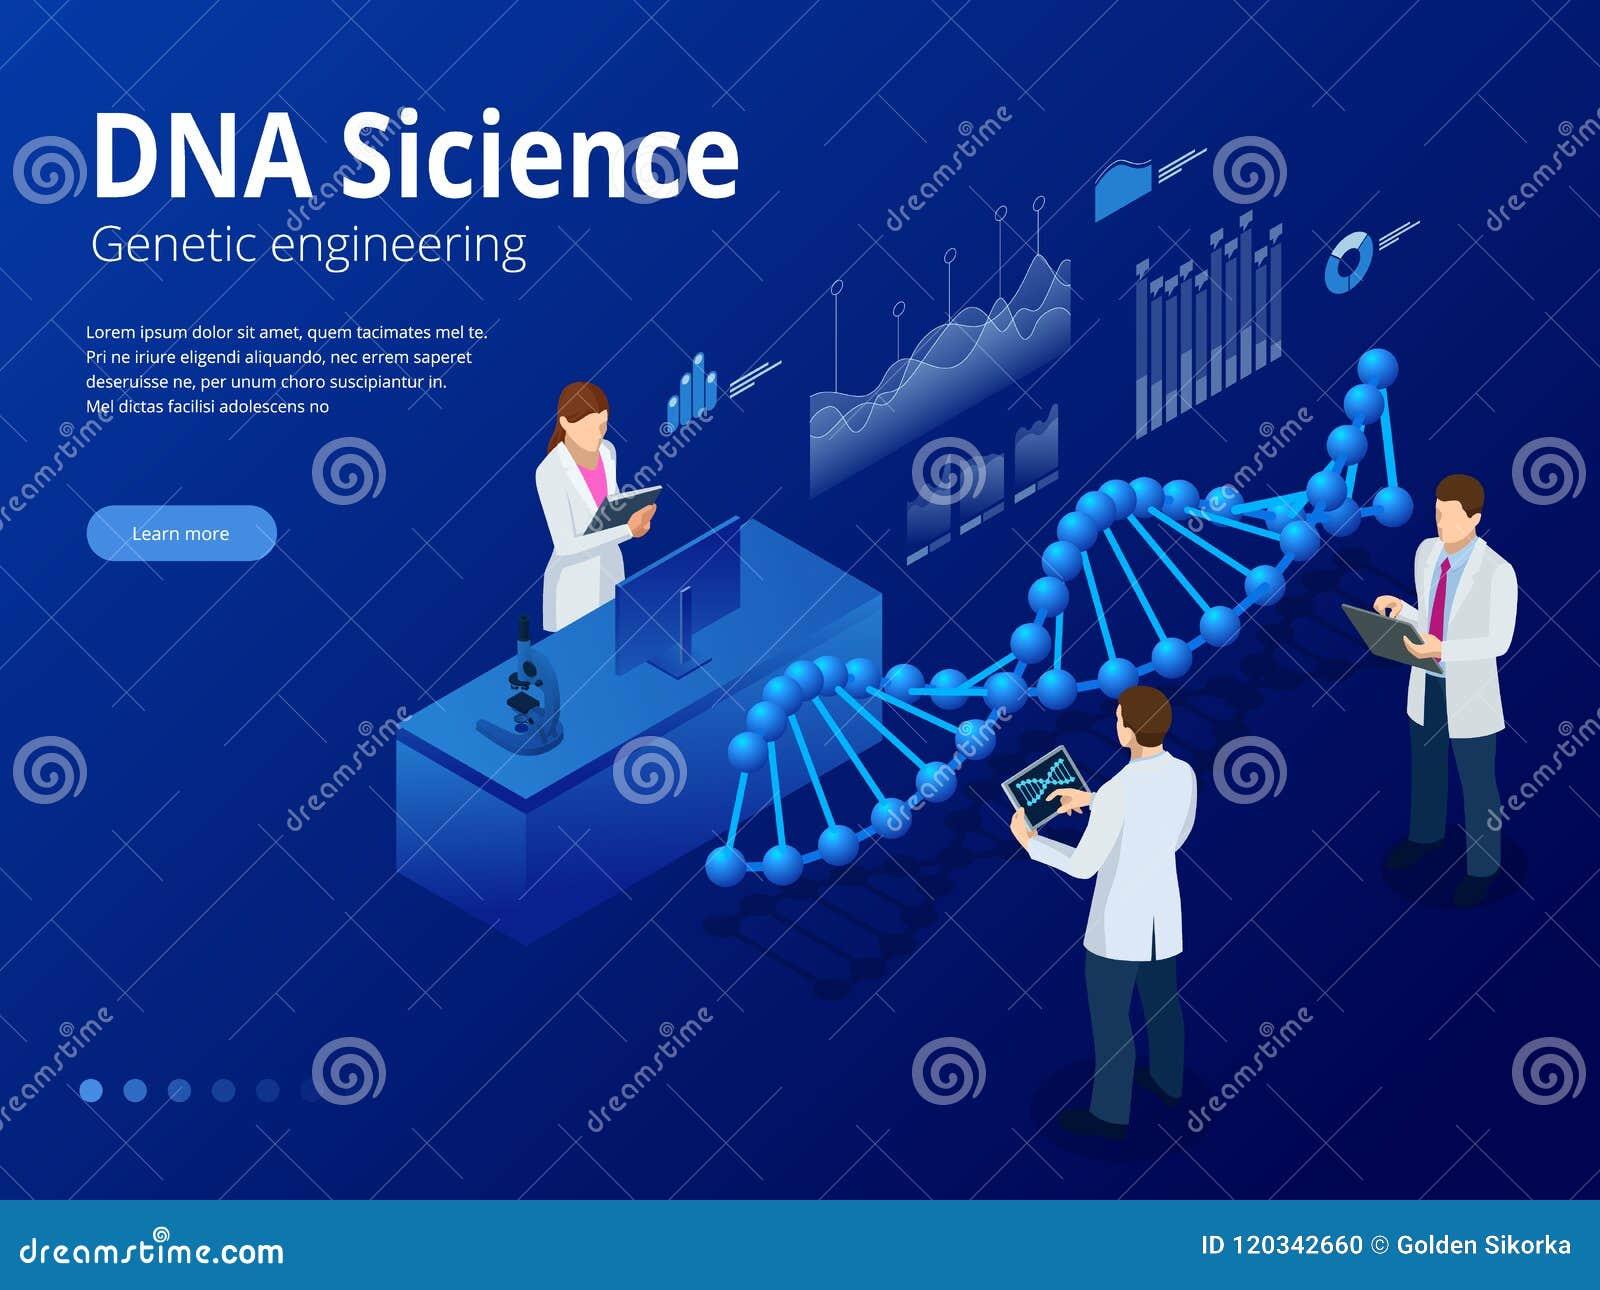 Datation réseau ADN